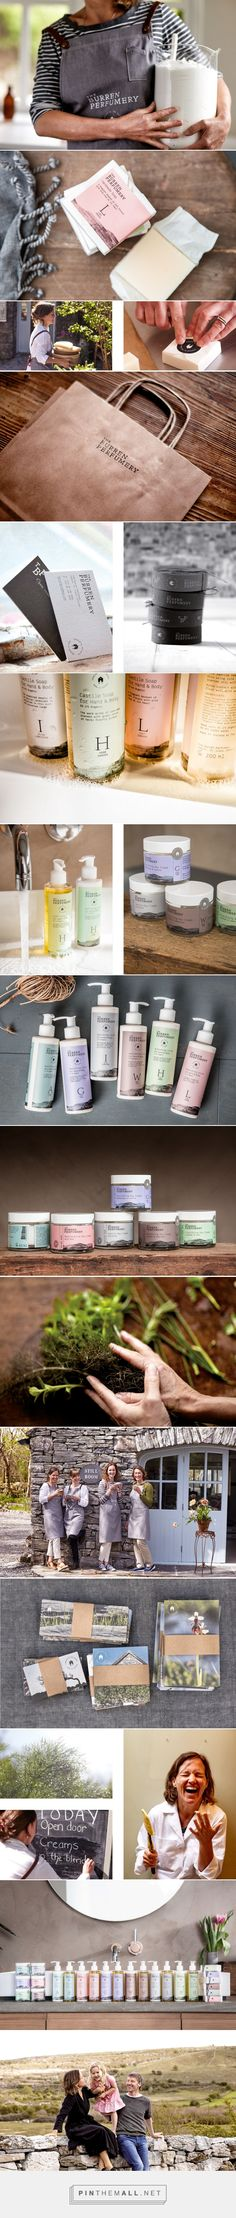 The Burren Perfumery - Packaging on Behance...